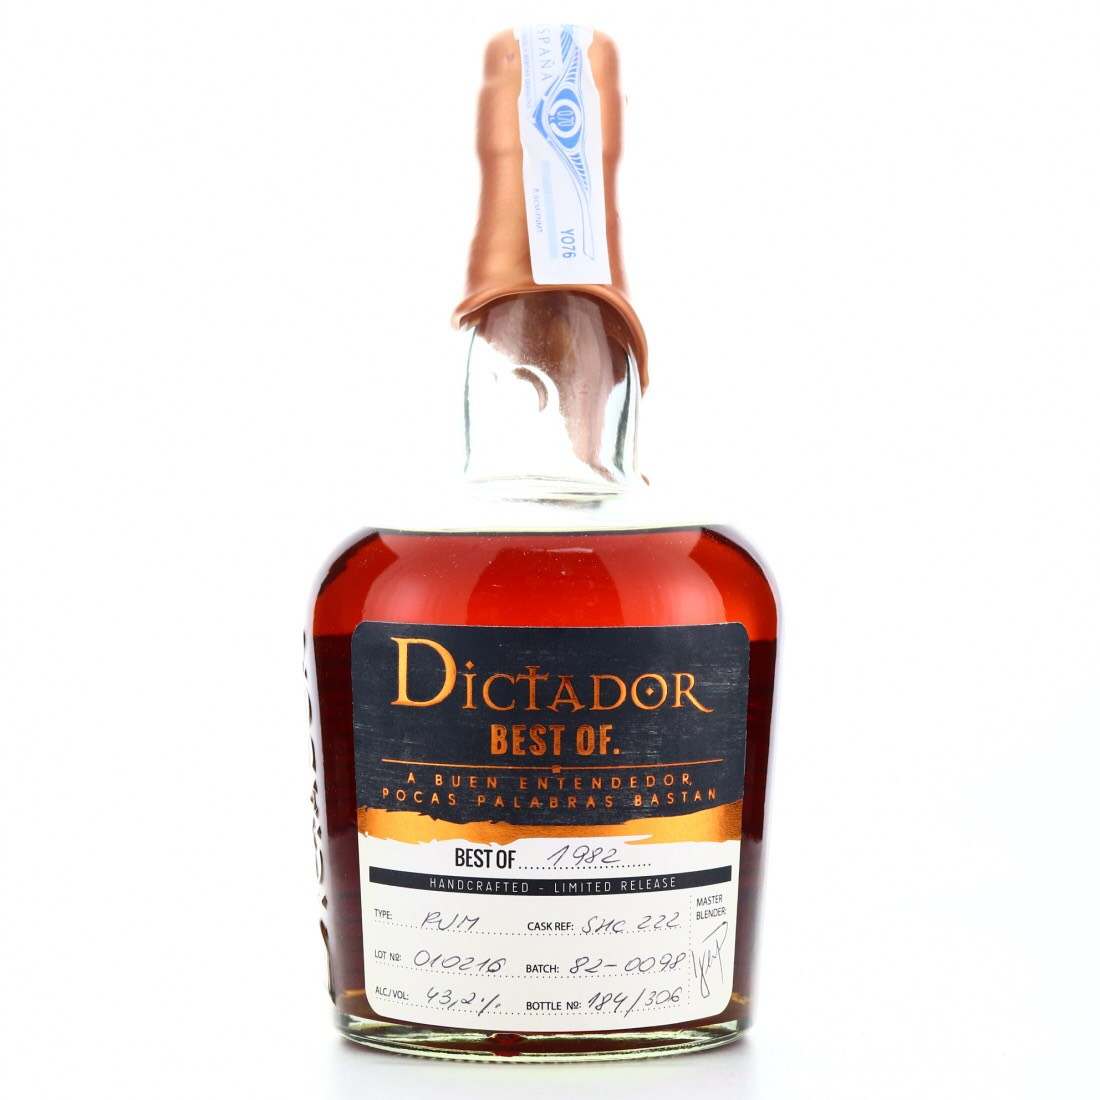 Bottle image of Dictador Best Of